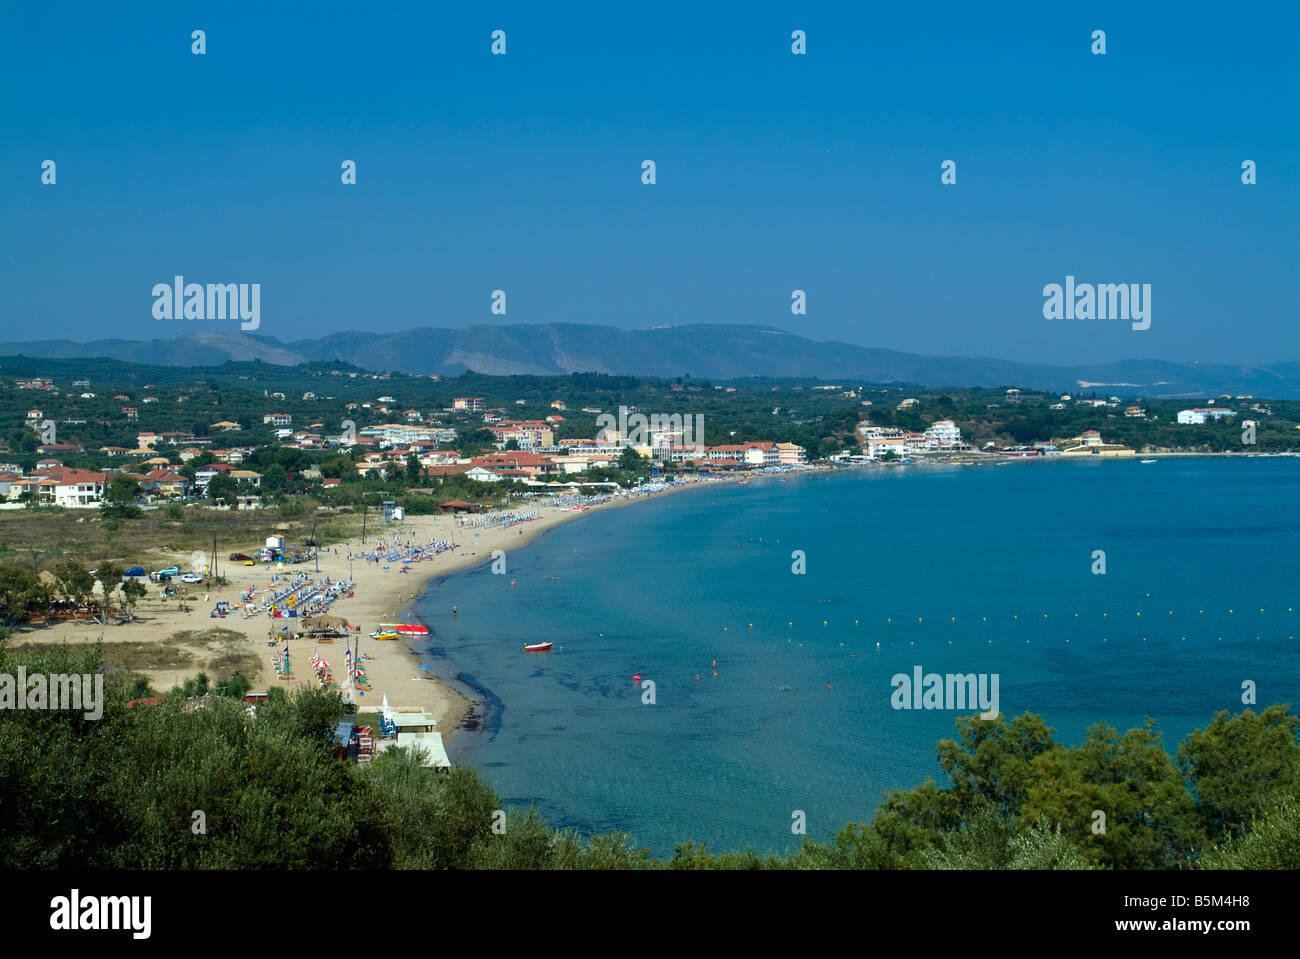 Tsilivi, Zakynthos, Ionian islands, Greece - Stock Image